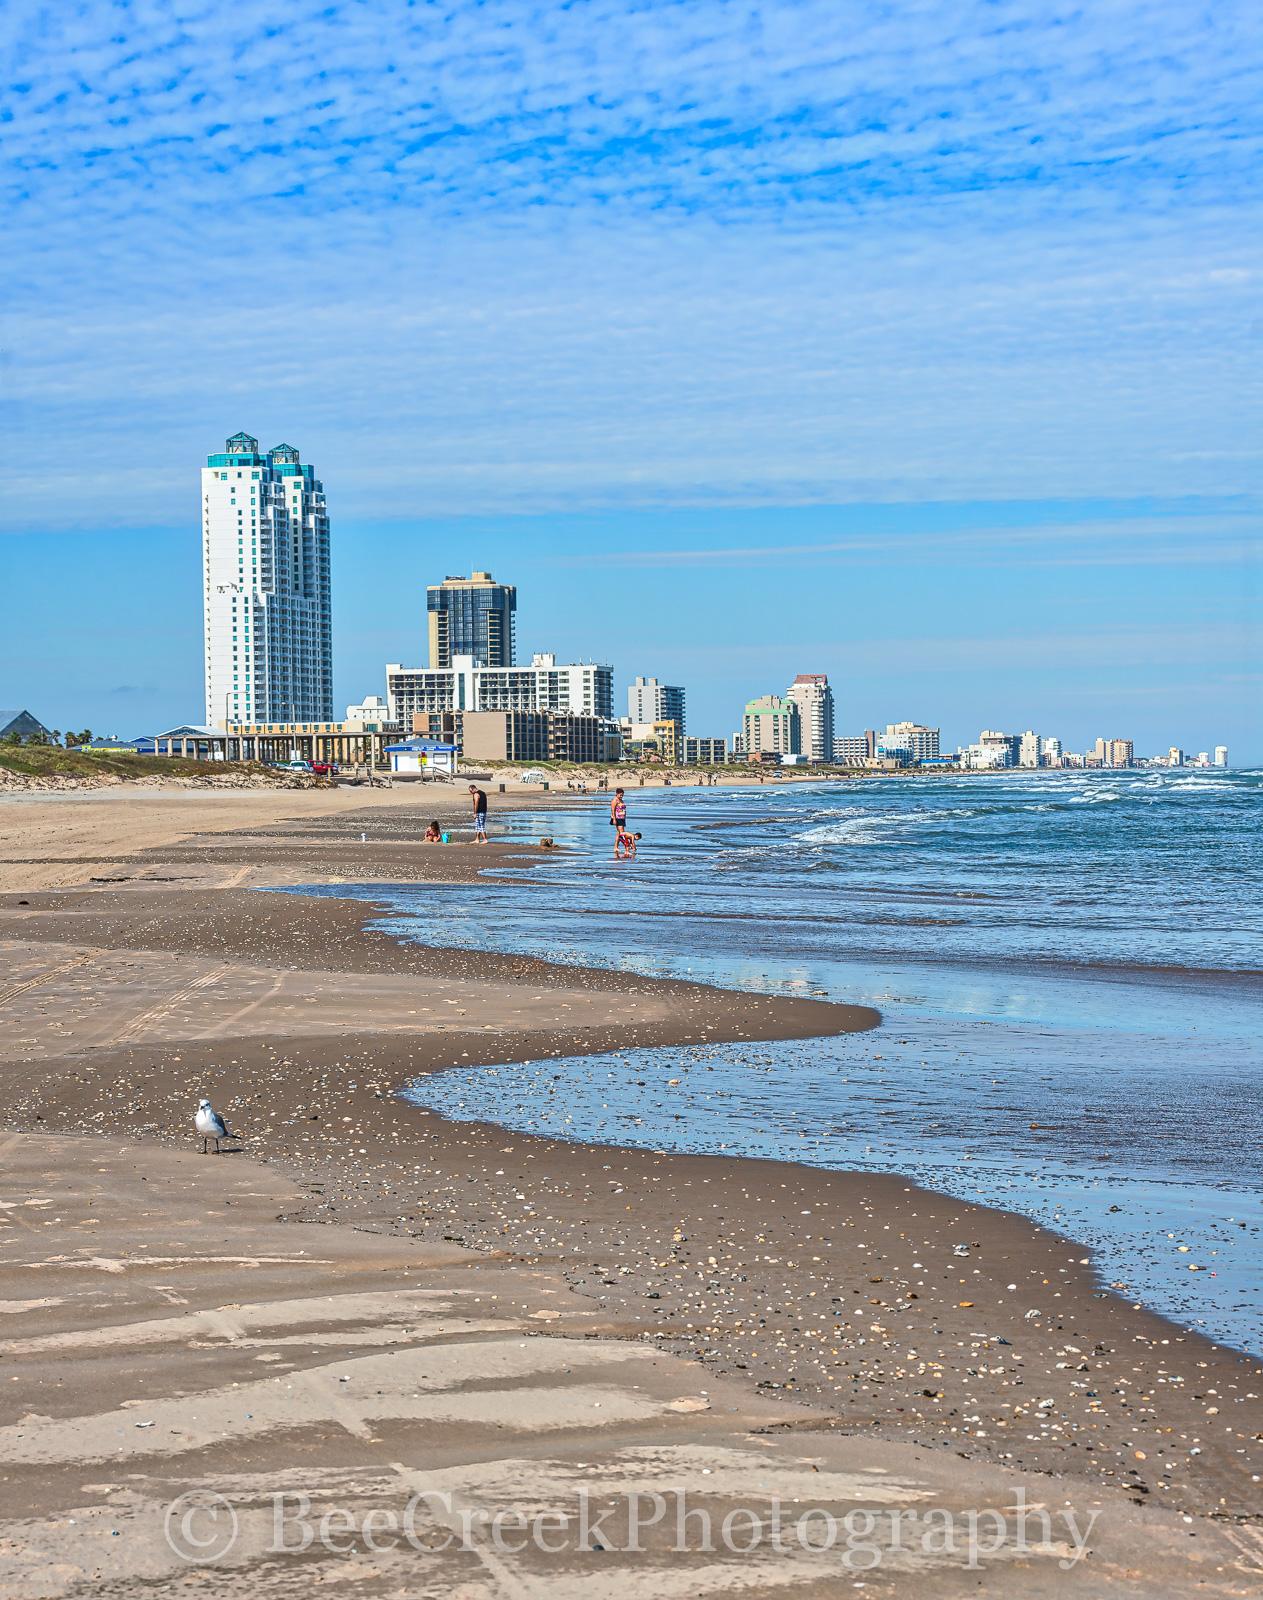 South Padre Island Texas Beach Coastal Dunes Hotels Landscape